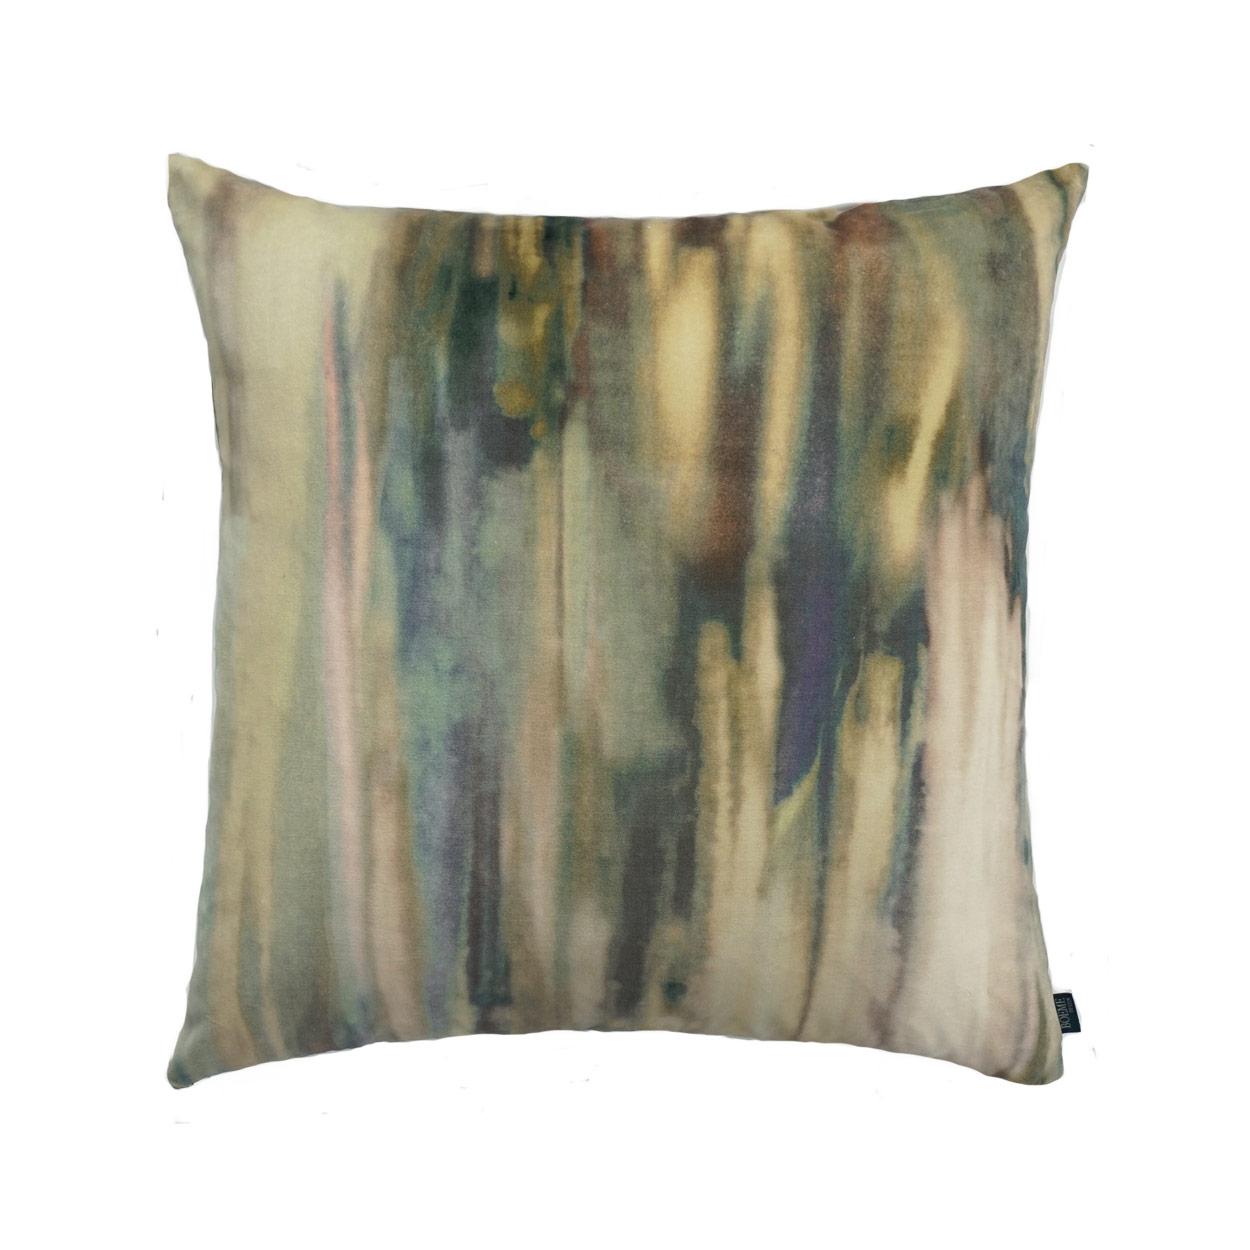 Boeme Cushion - Strata Nero